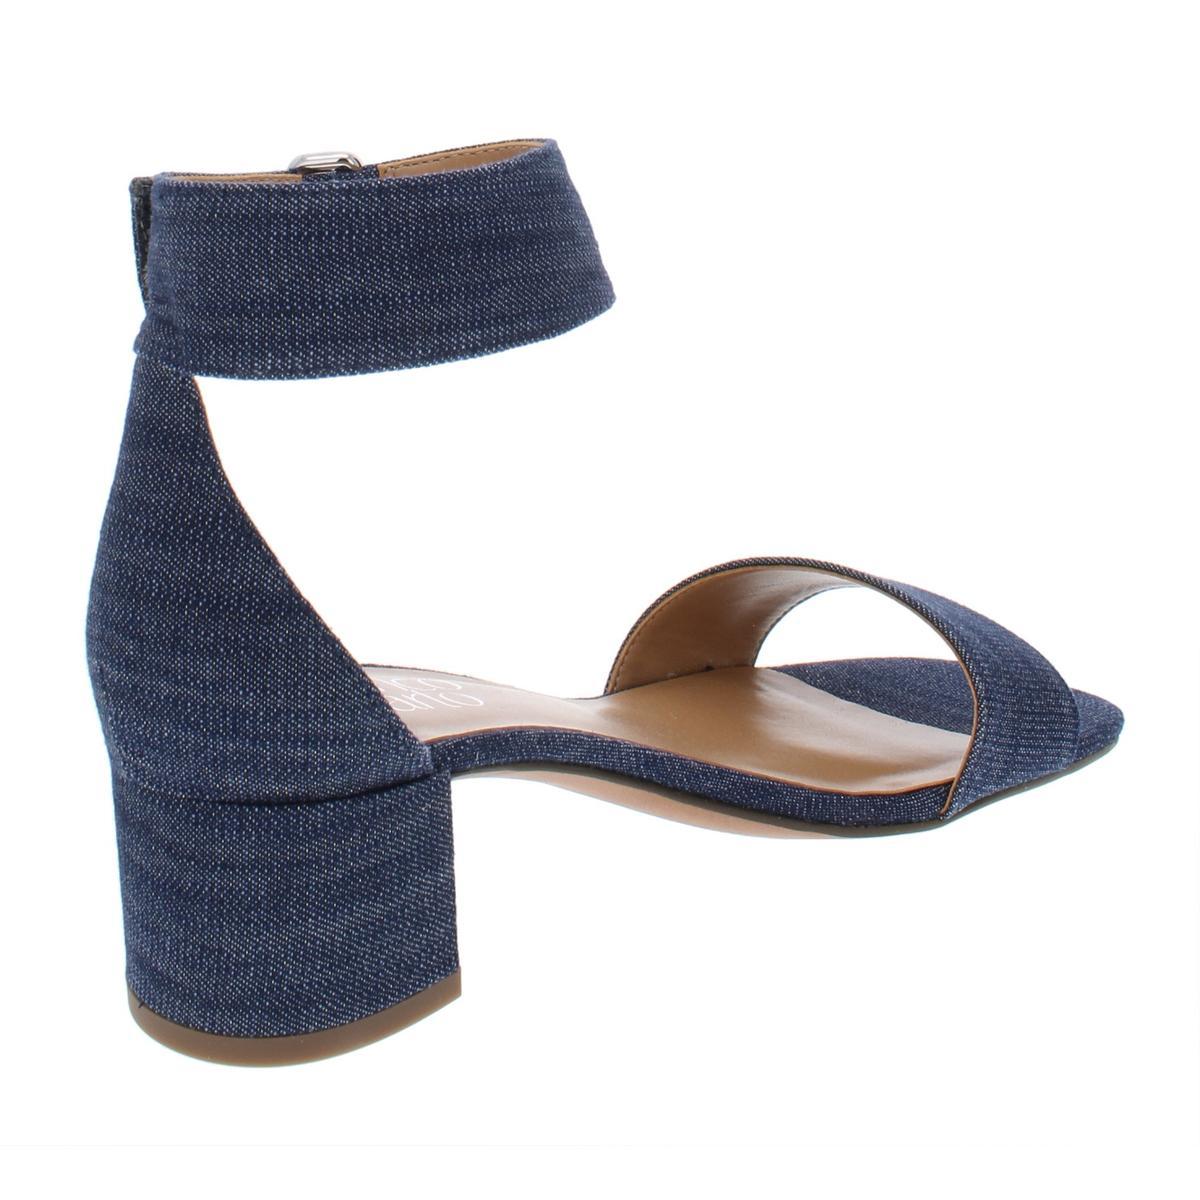 Franco-Sarto-Womens-Rosalina-Solid-Block-Heel-Dress-Sandals-Evening-BHFO-6957 thumbnail 4